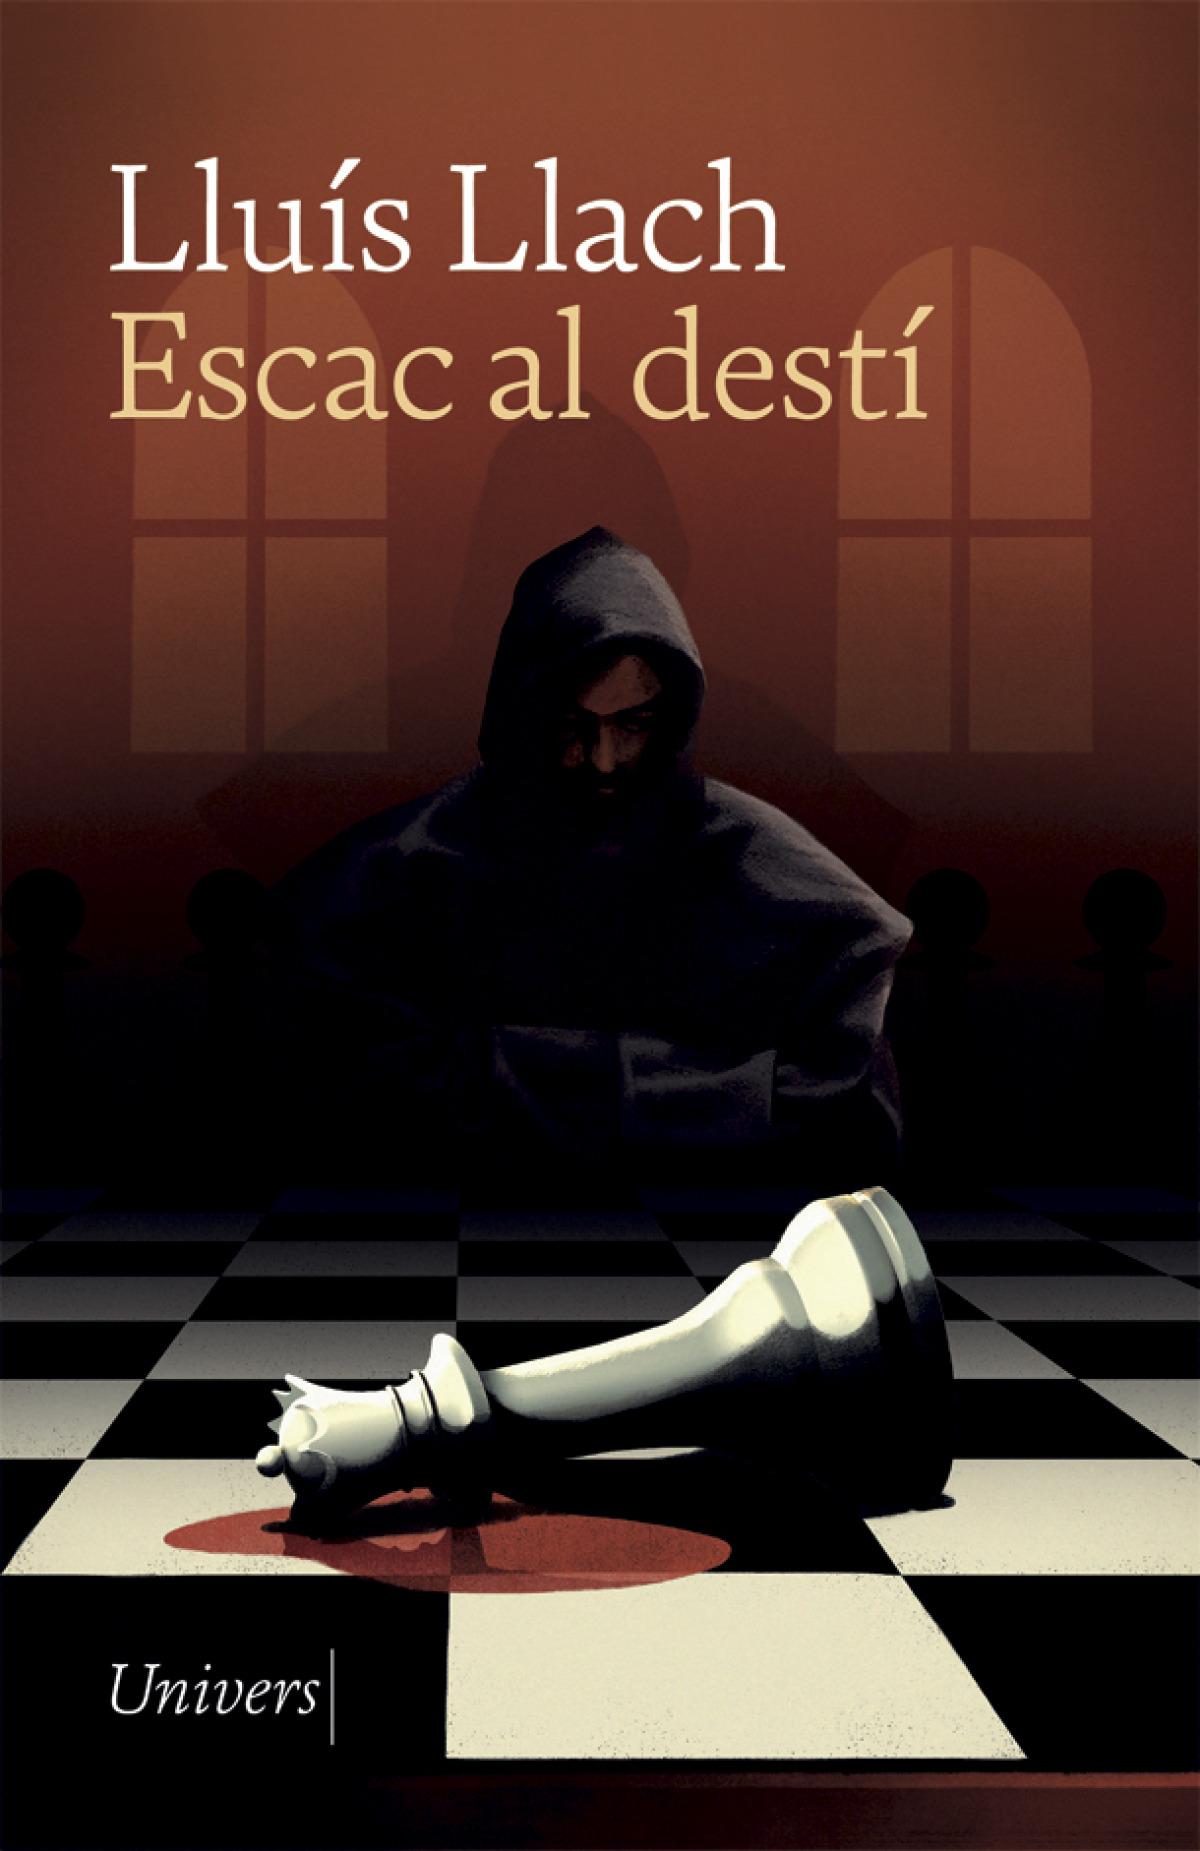 Escac al dest¡ 9788417868550